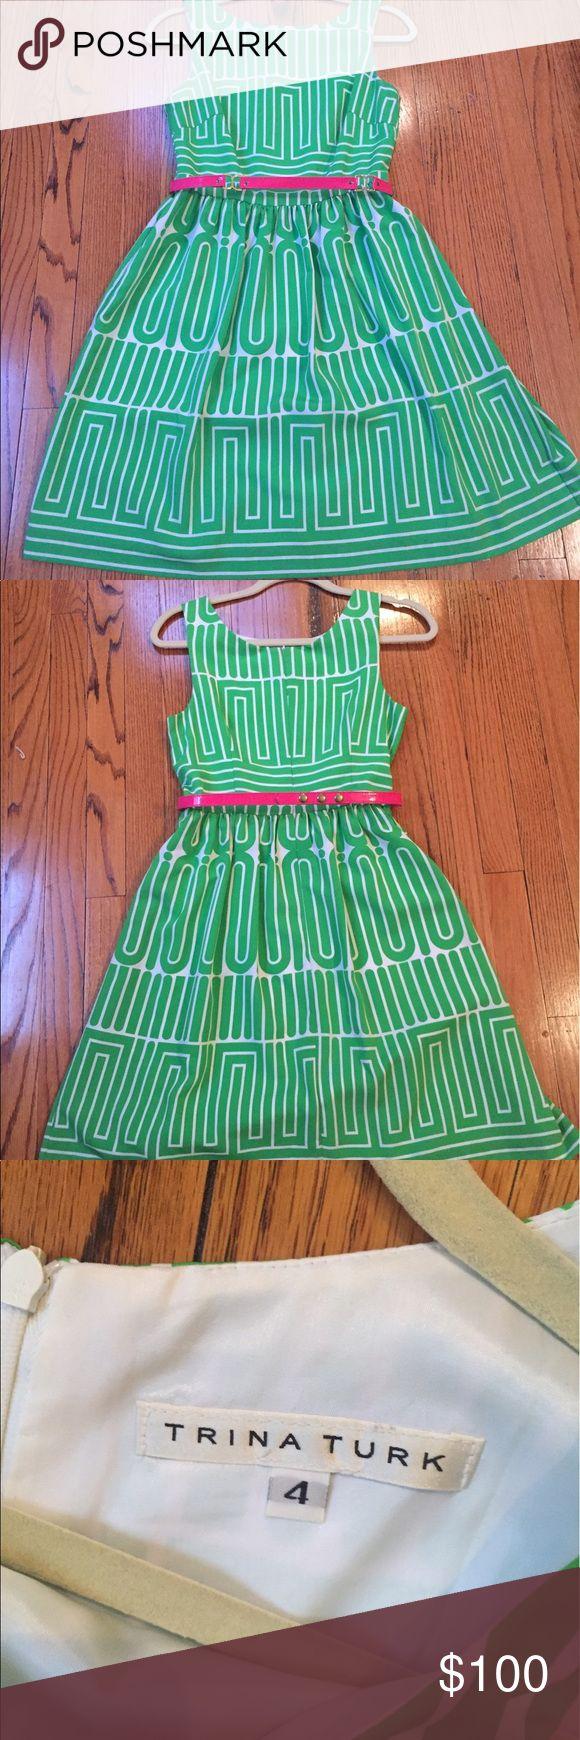 Trina Turk Dress Only worn once!! Great dress for bridesmaid luncheon, church, etc!! Trina Turk Dresses Wedding